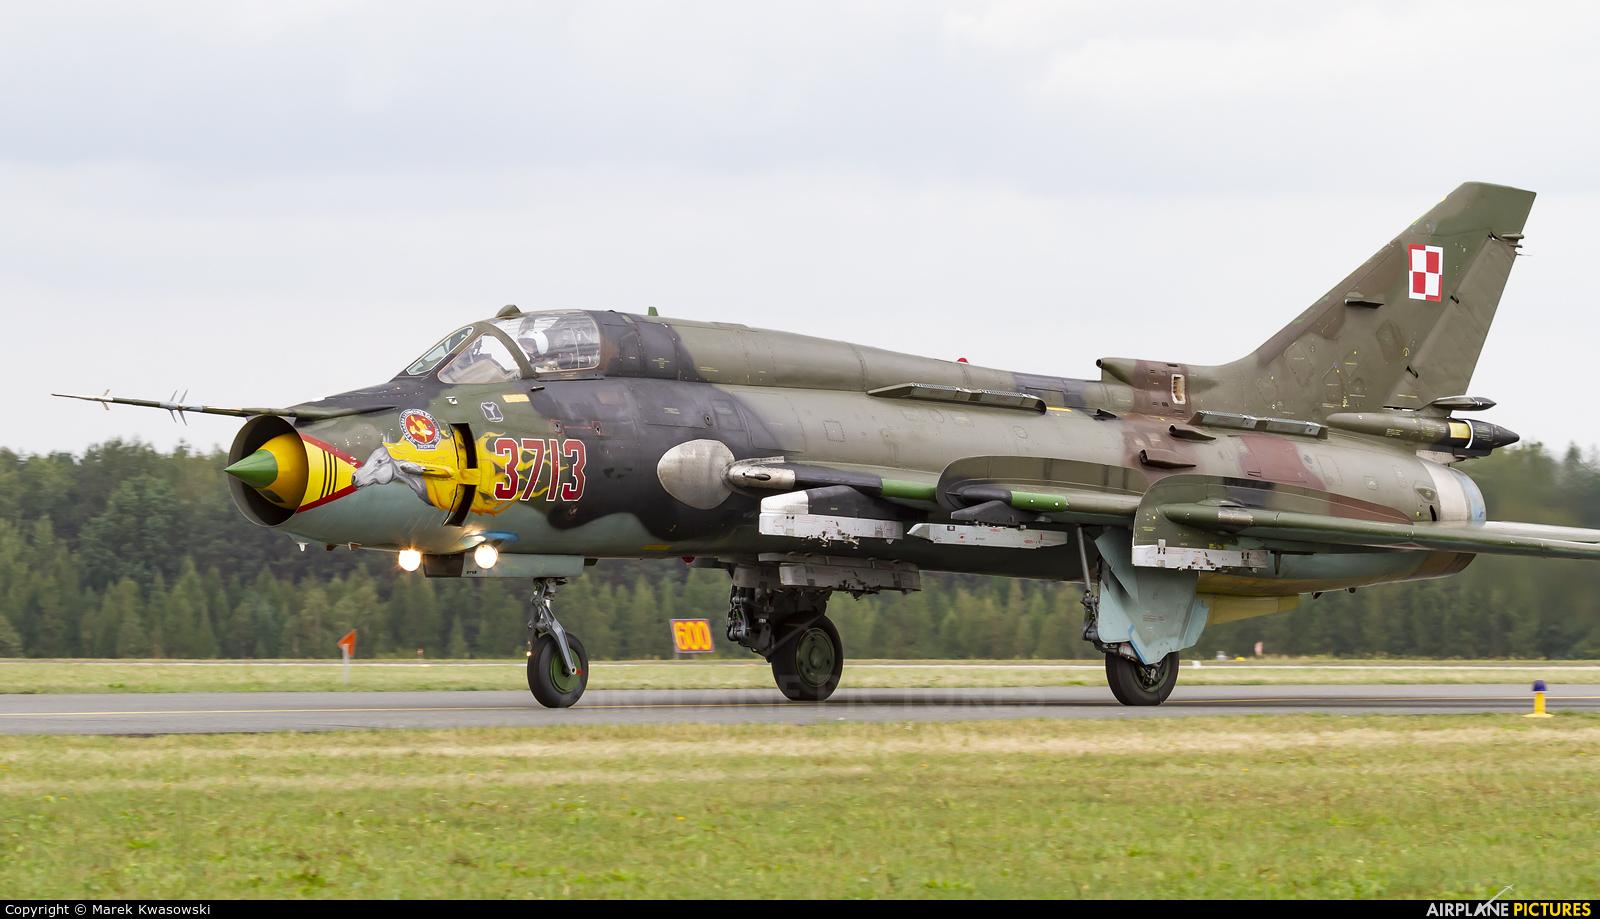 Poland - Air Force 3713 aircraft at Łask AB